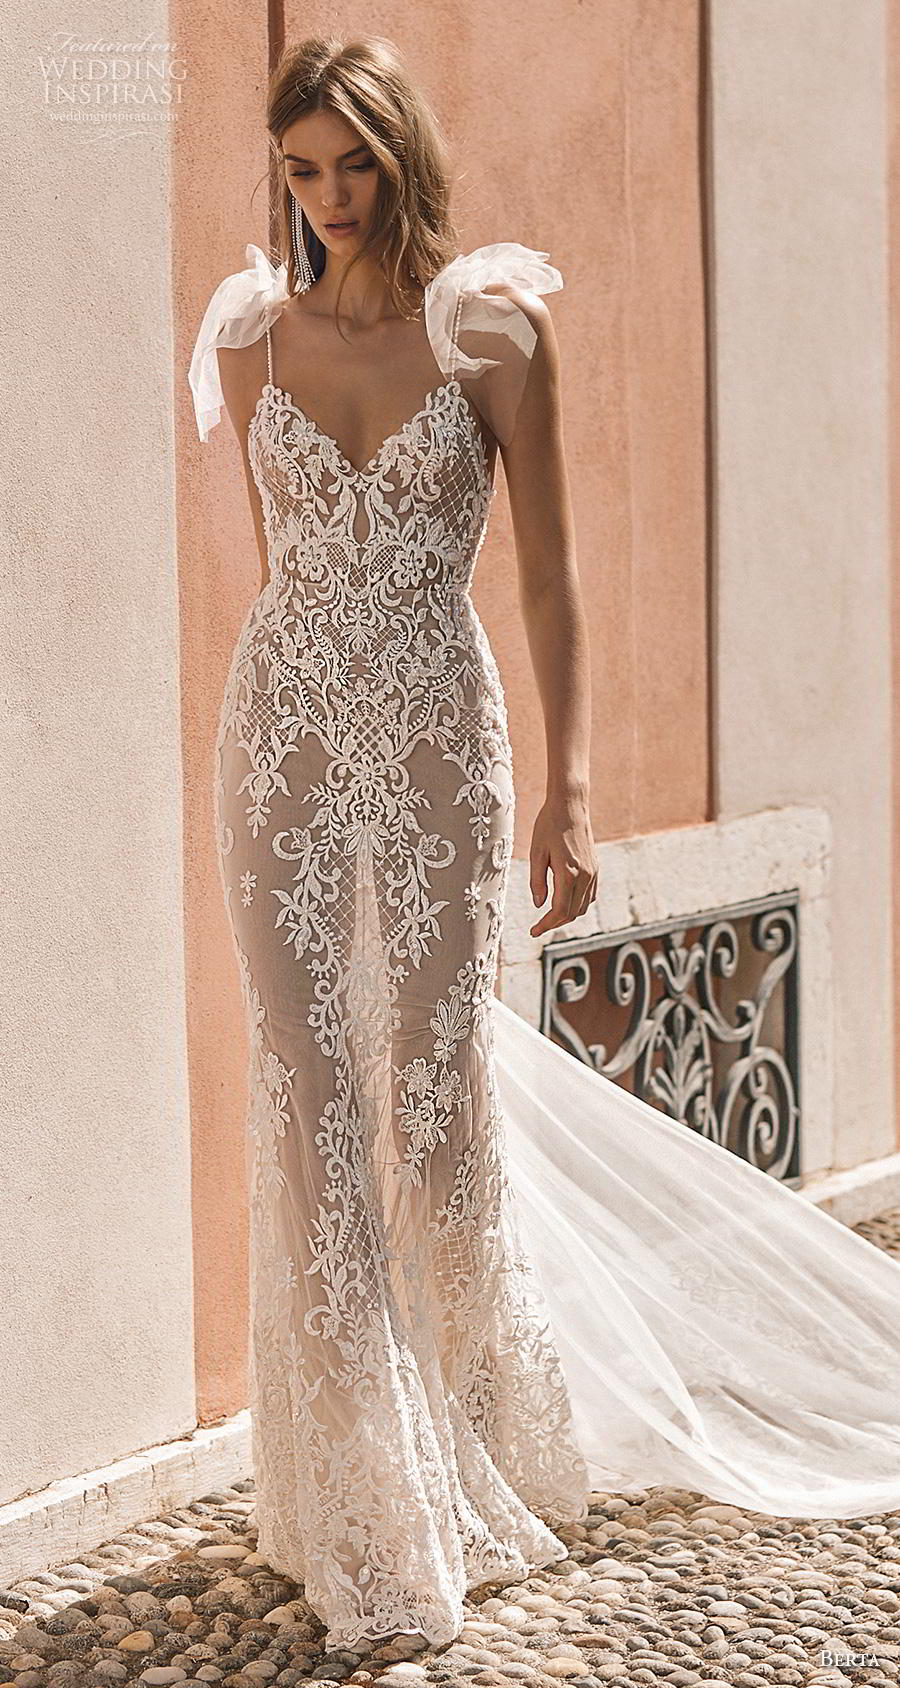 berta 2019 privee bridal thin strap diamond neck full embellishment elegant glamorous sheath wedding dress backless chapel train (5) mv